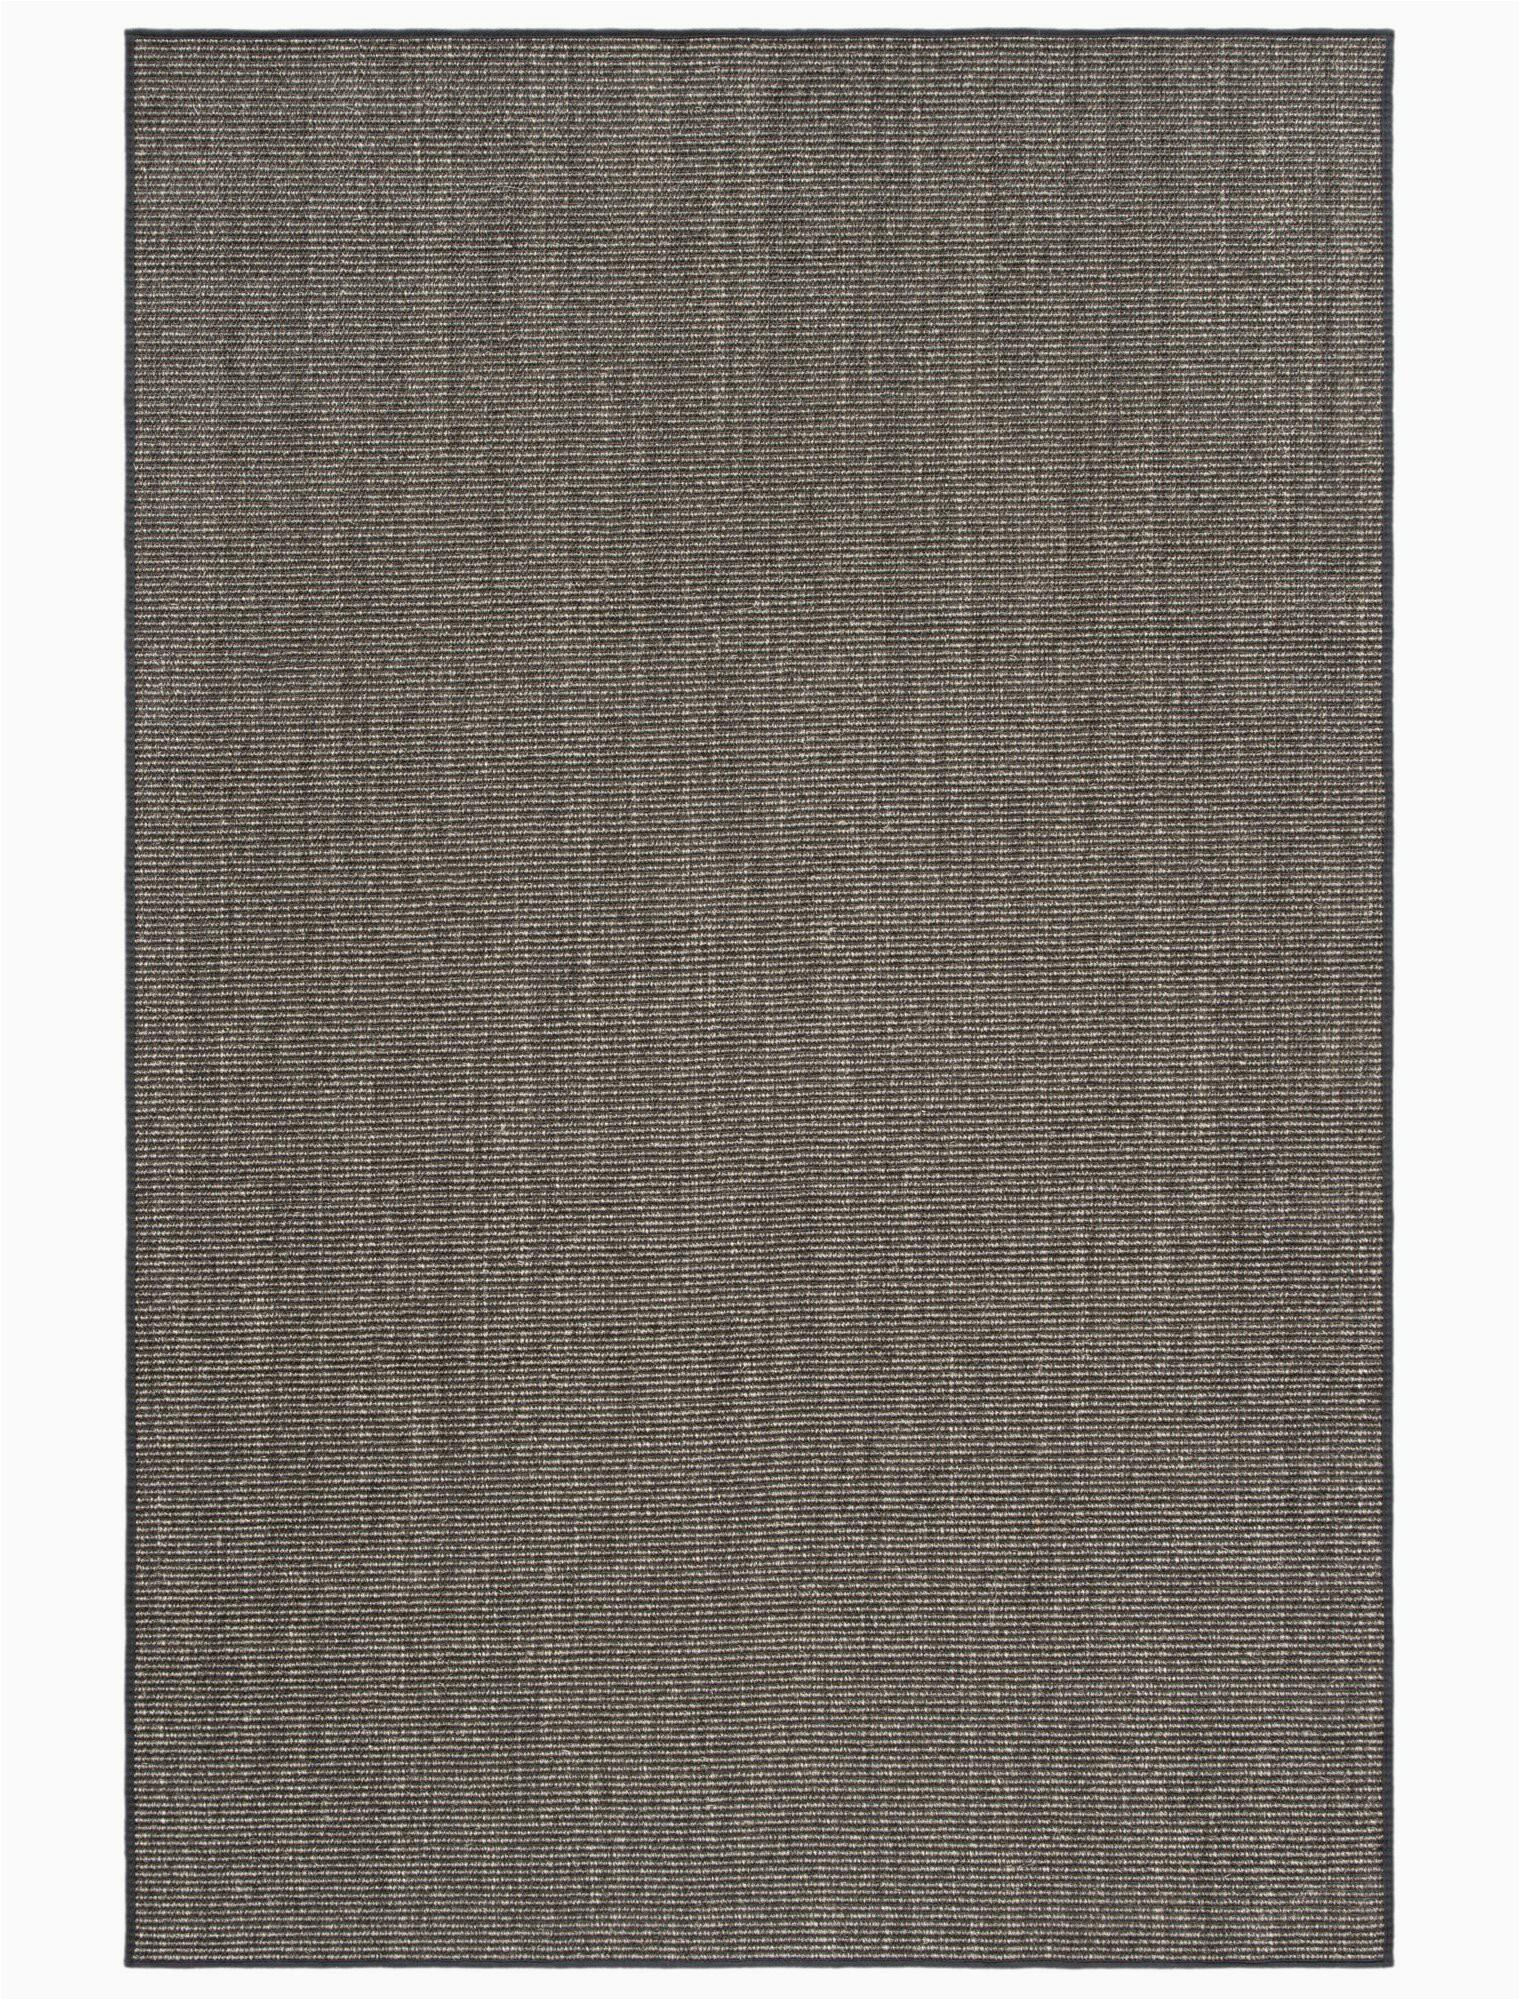 Martha Stewart Manor House area Rug Martha Stewart 9501 Power Loom Jute Sisal Charcoal Indoor area Rug